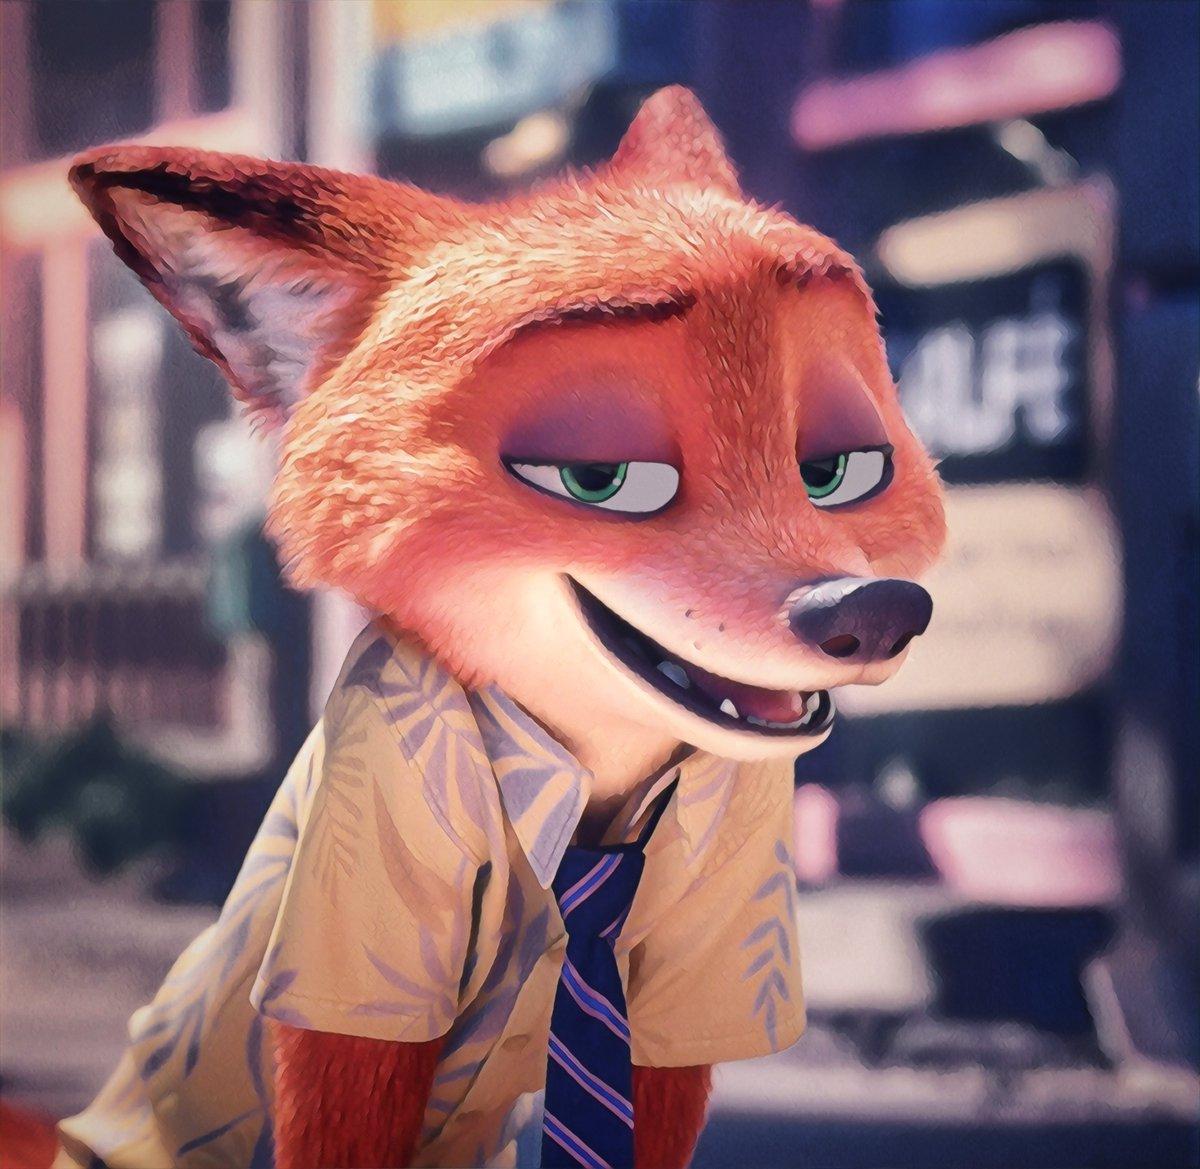 Hey, do you want me to guess what you are thinking now? #bunny #cute #fox #zootopia #nickwilde #judyhopps #furry #furryart #movie #cartoon pic.twitter.com/AfAWxDetag